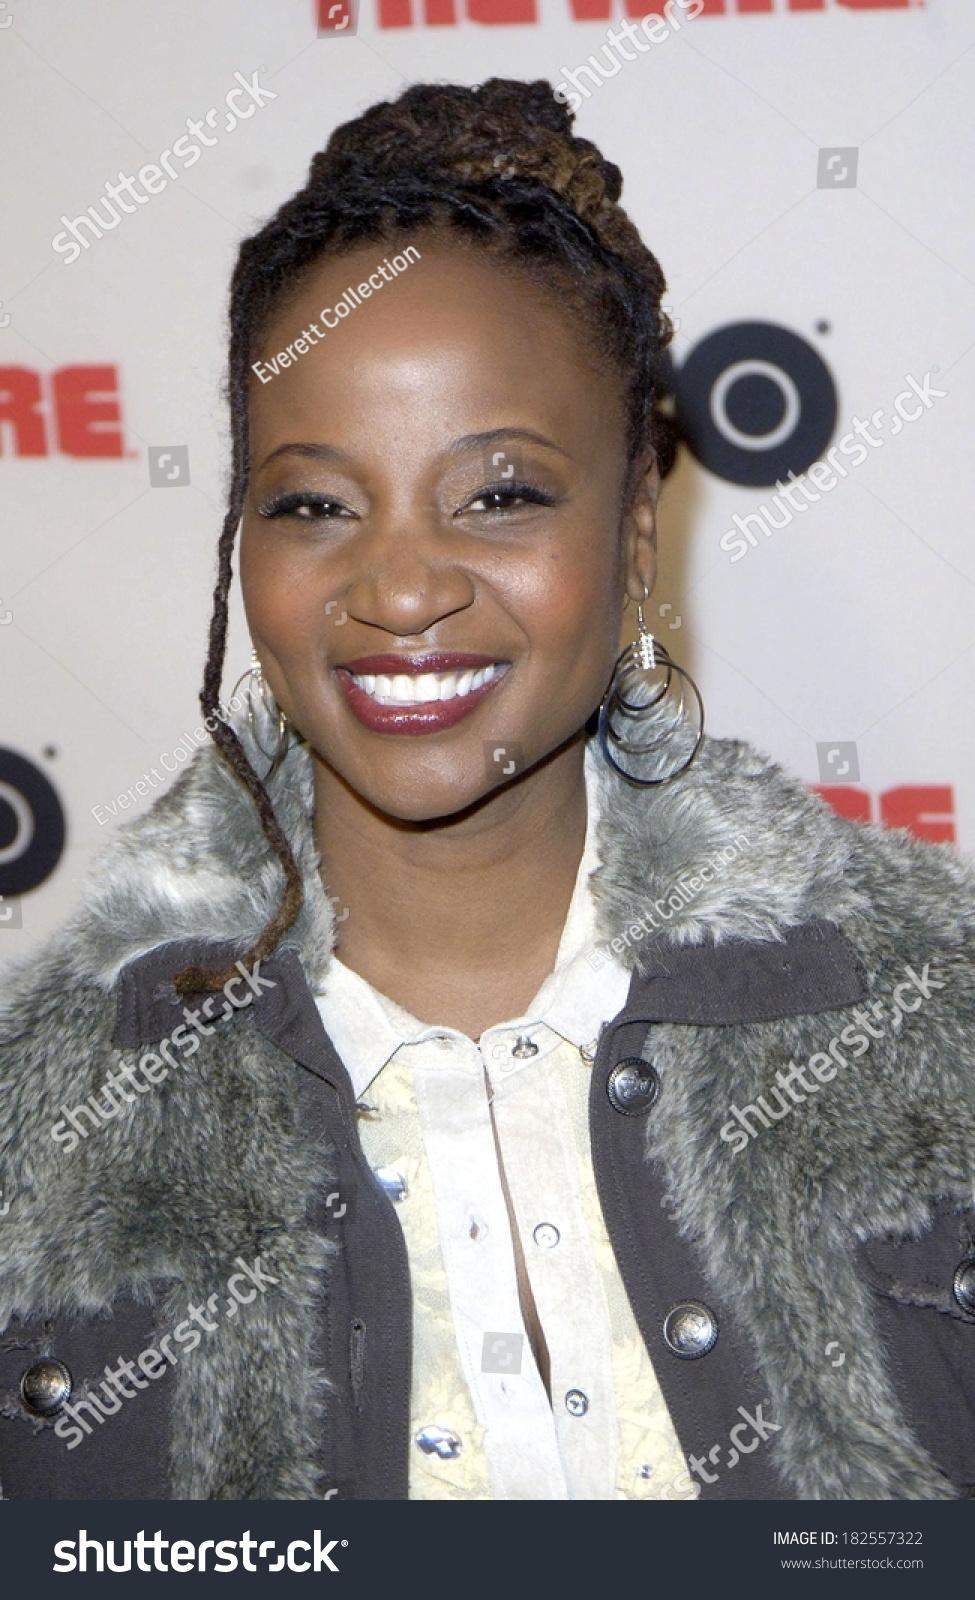 Communication on this topic: Rosemary Rice, melanie-nicholls-king/